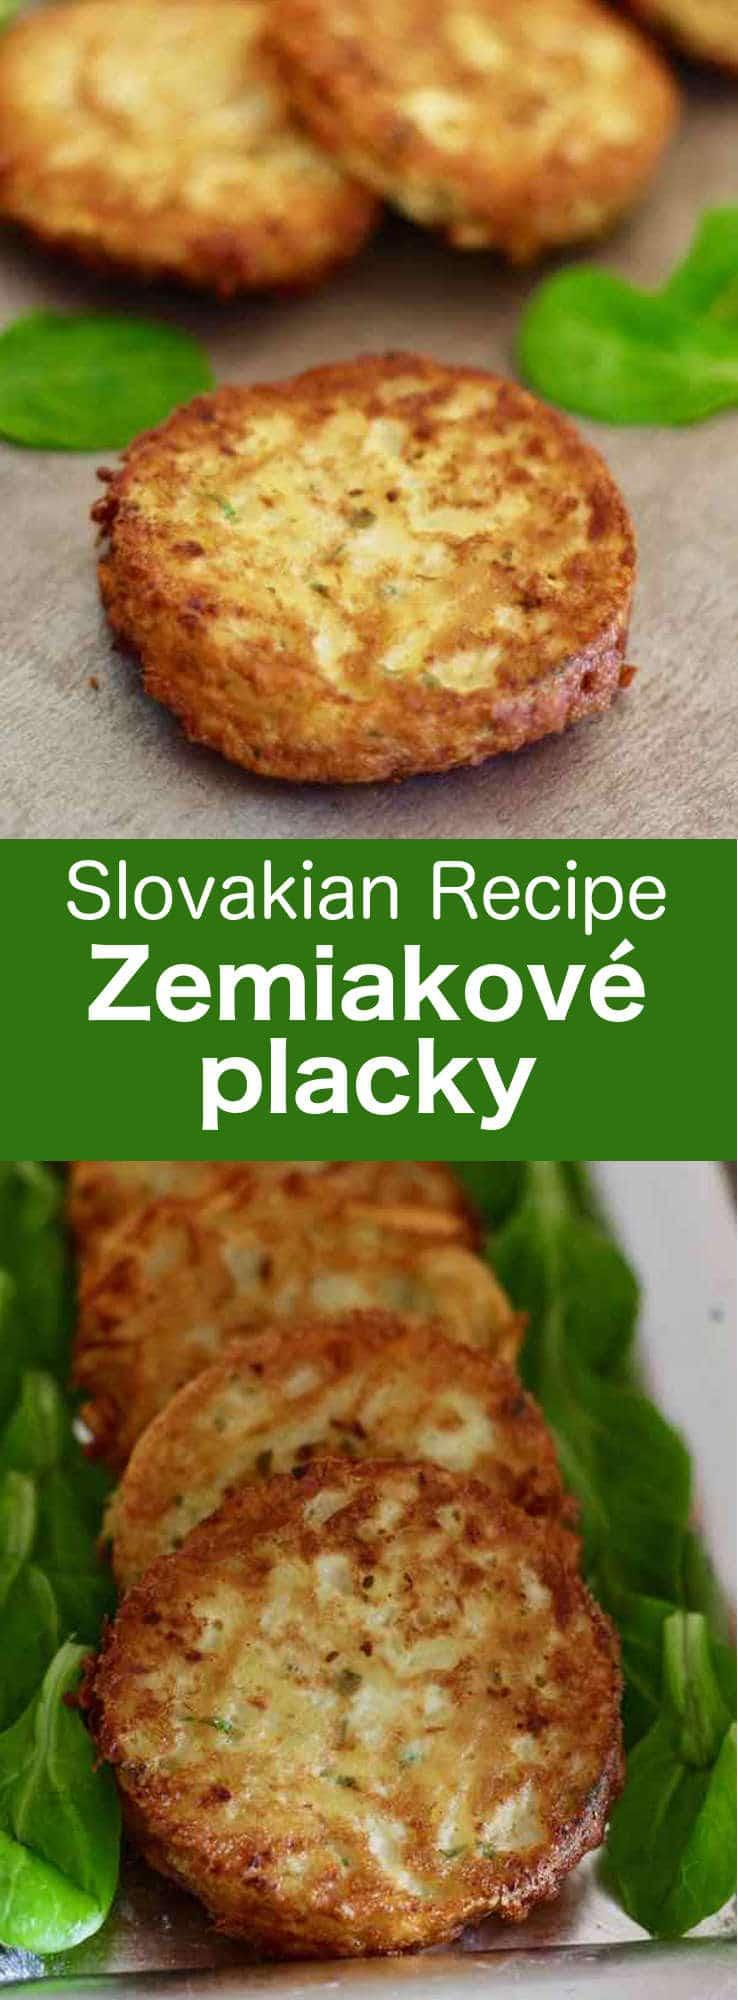 Zemiakové placky (bramboráky) are traditional Slovak potato pancakes, similar to latkes but seasoned with marjoram, which are also called haruľa. #Slovakia #196flavors